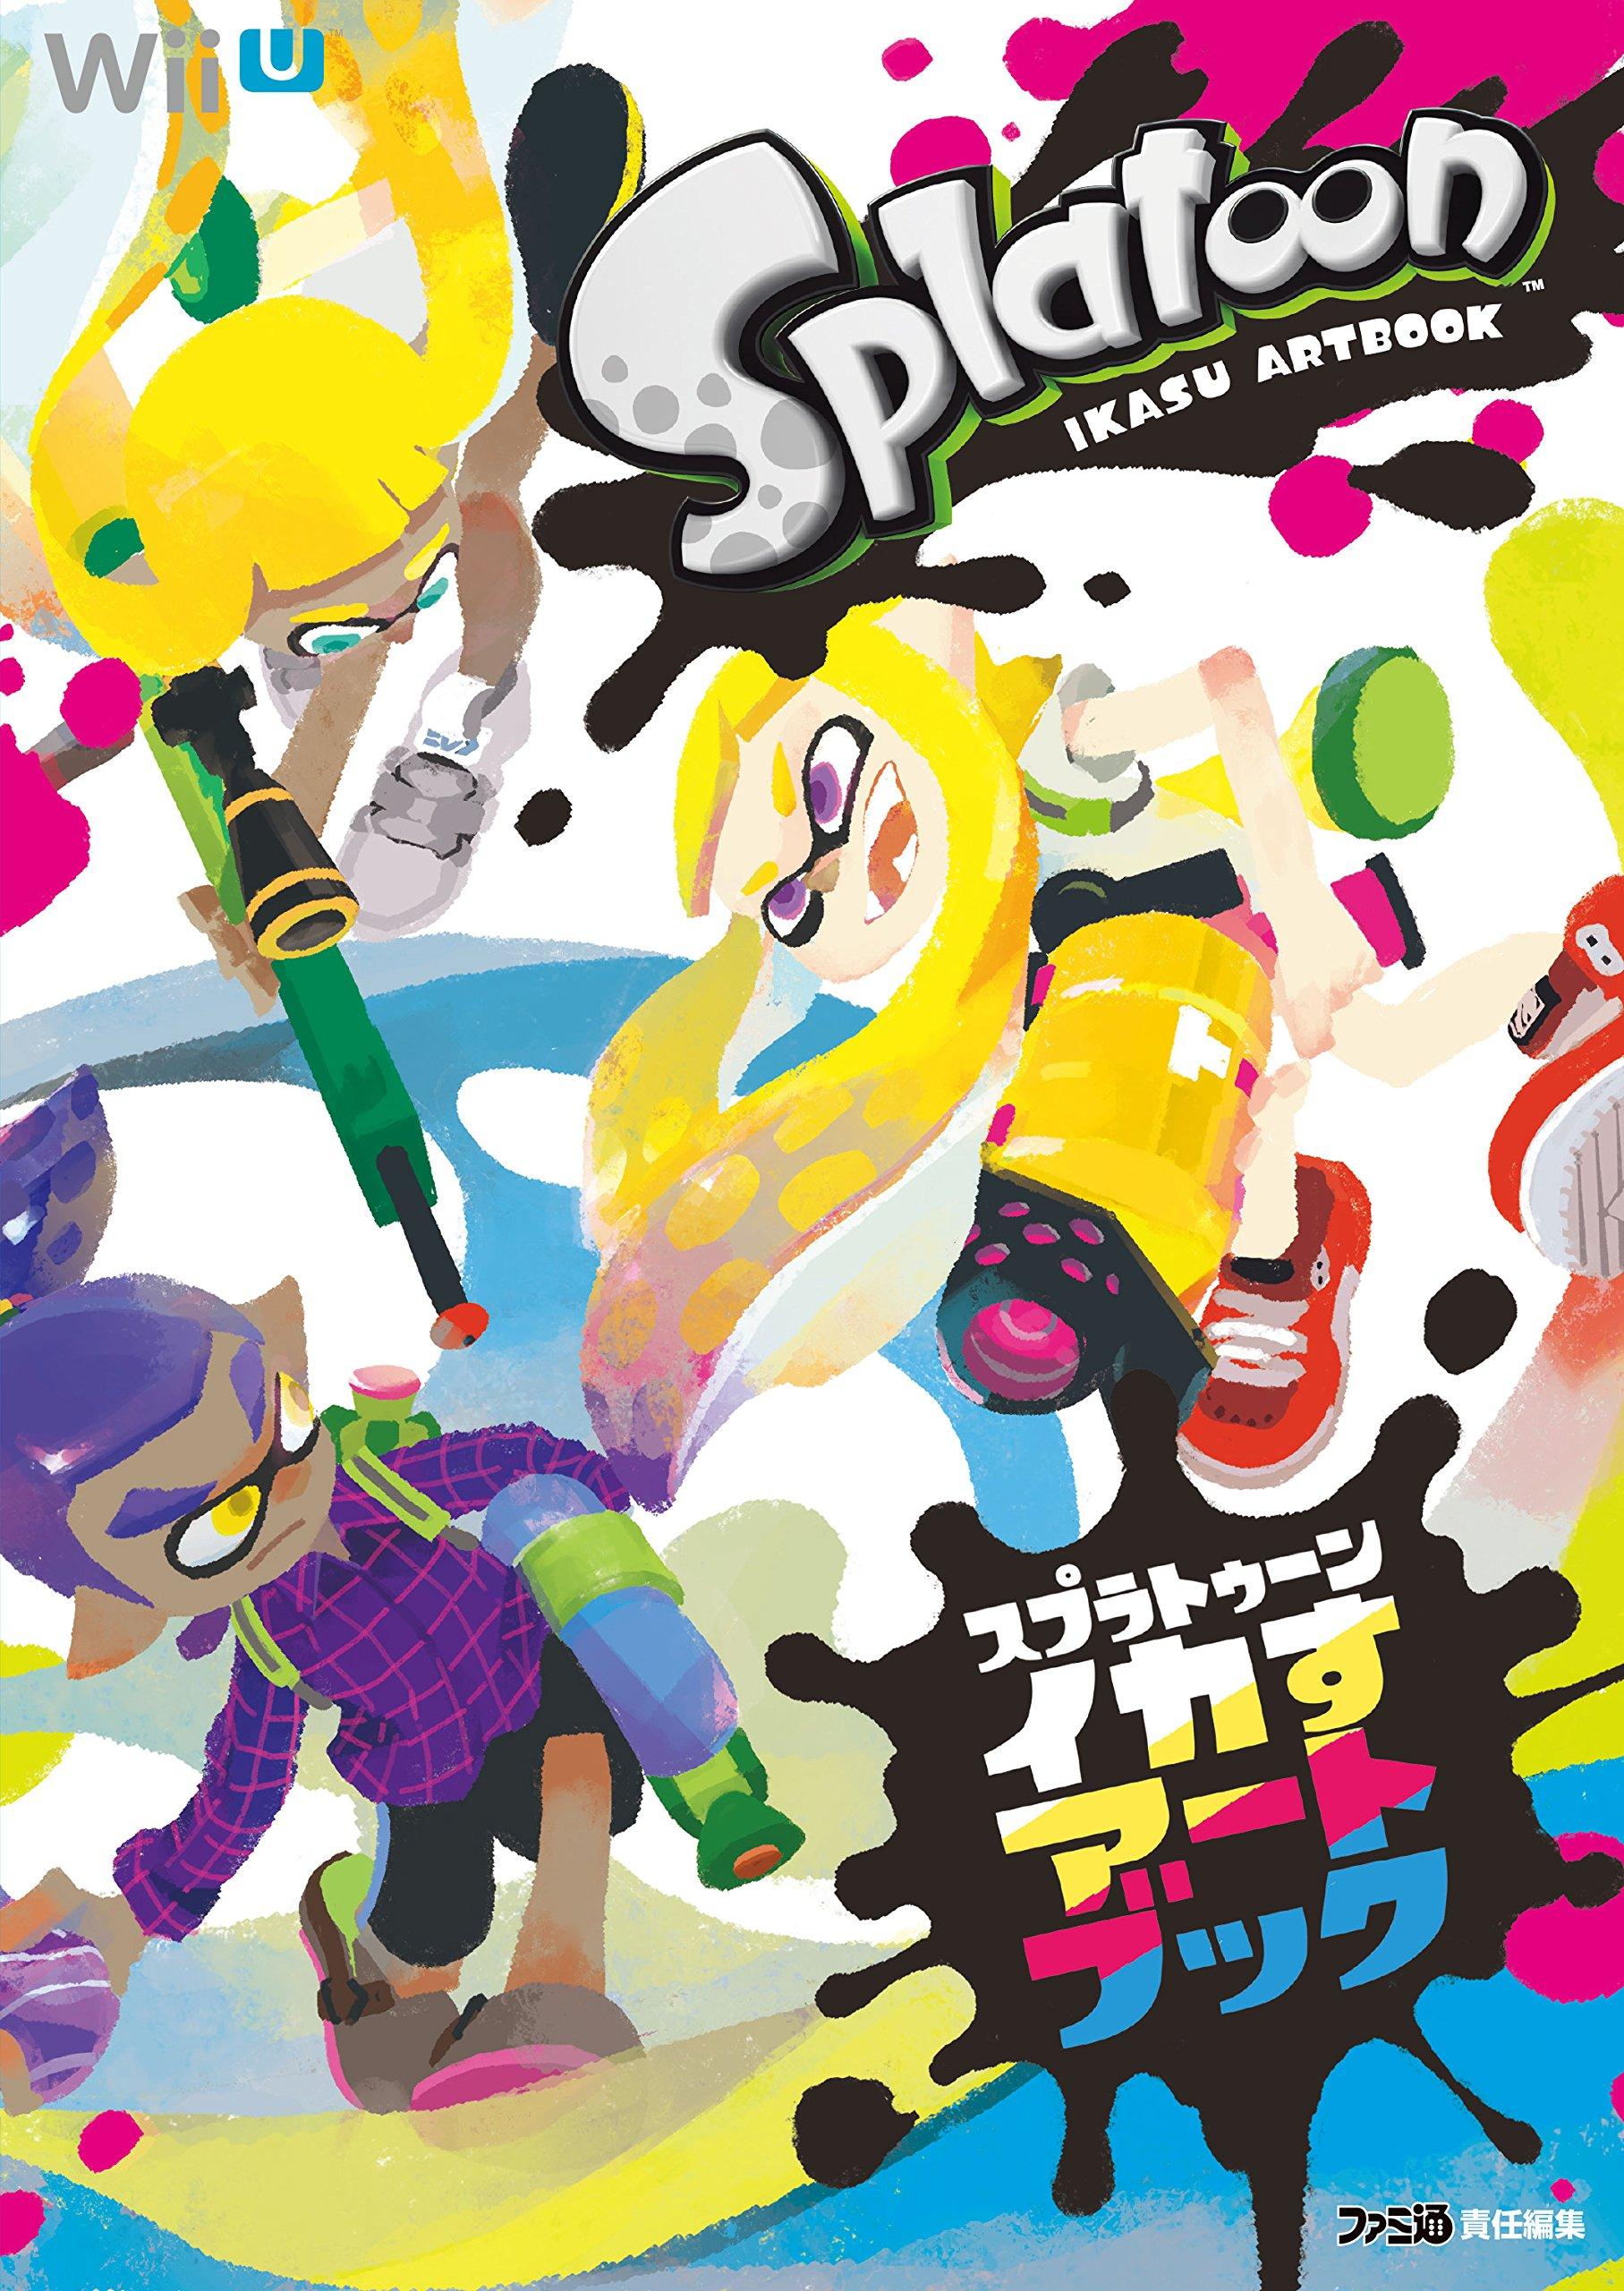 Read Online Splatoon IKASU ART BOOK KADOKAWA Enter Frain Illustrations by Famitsu pdf